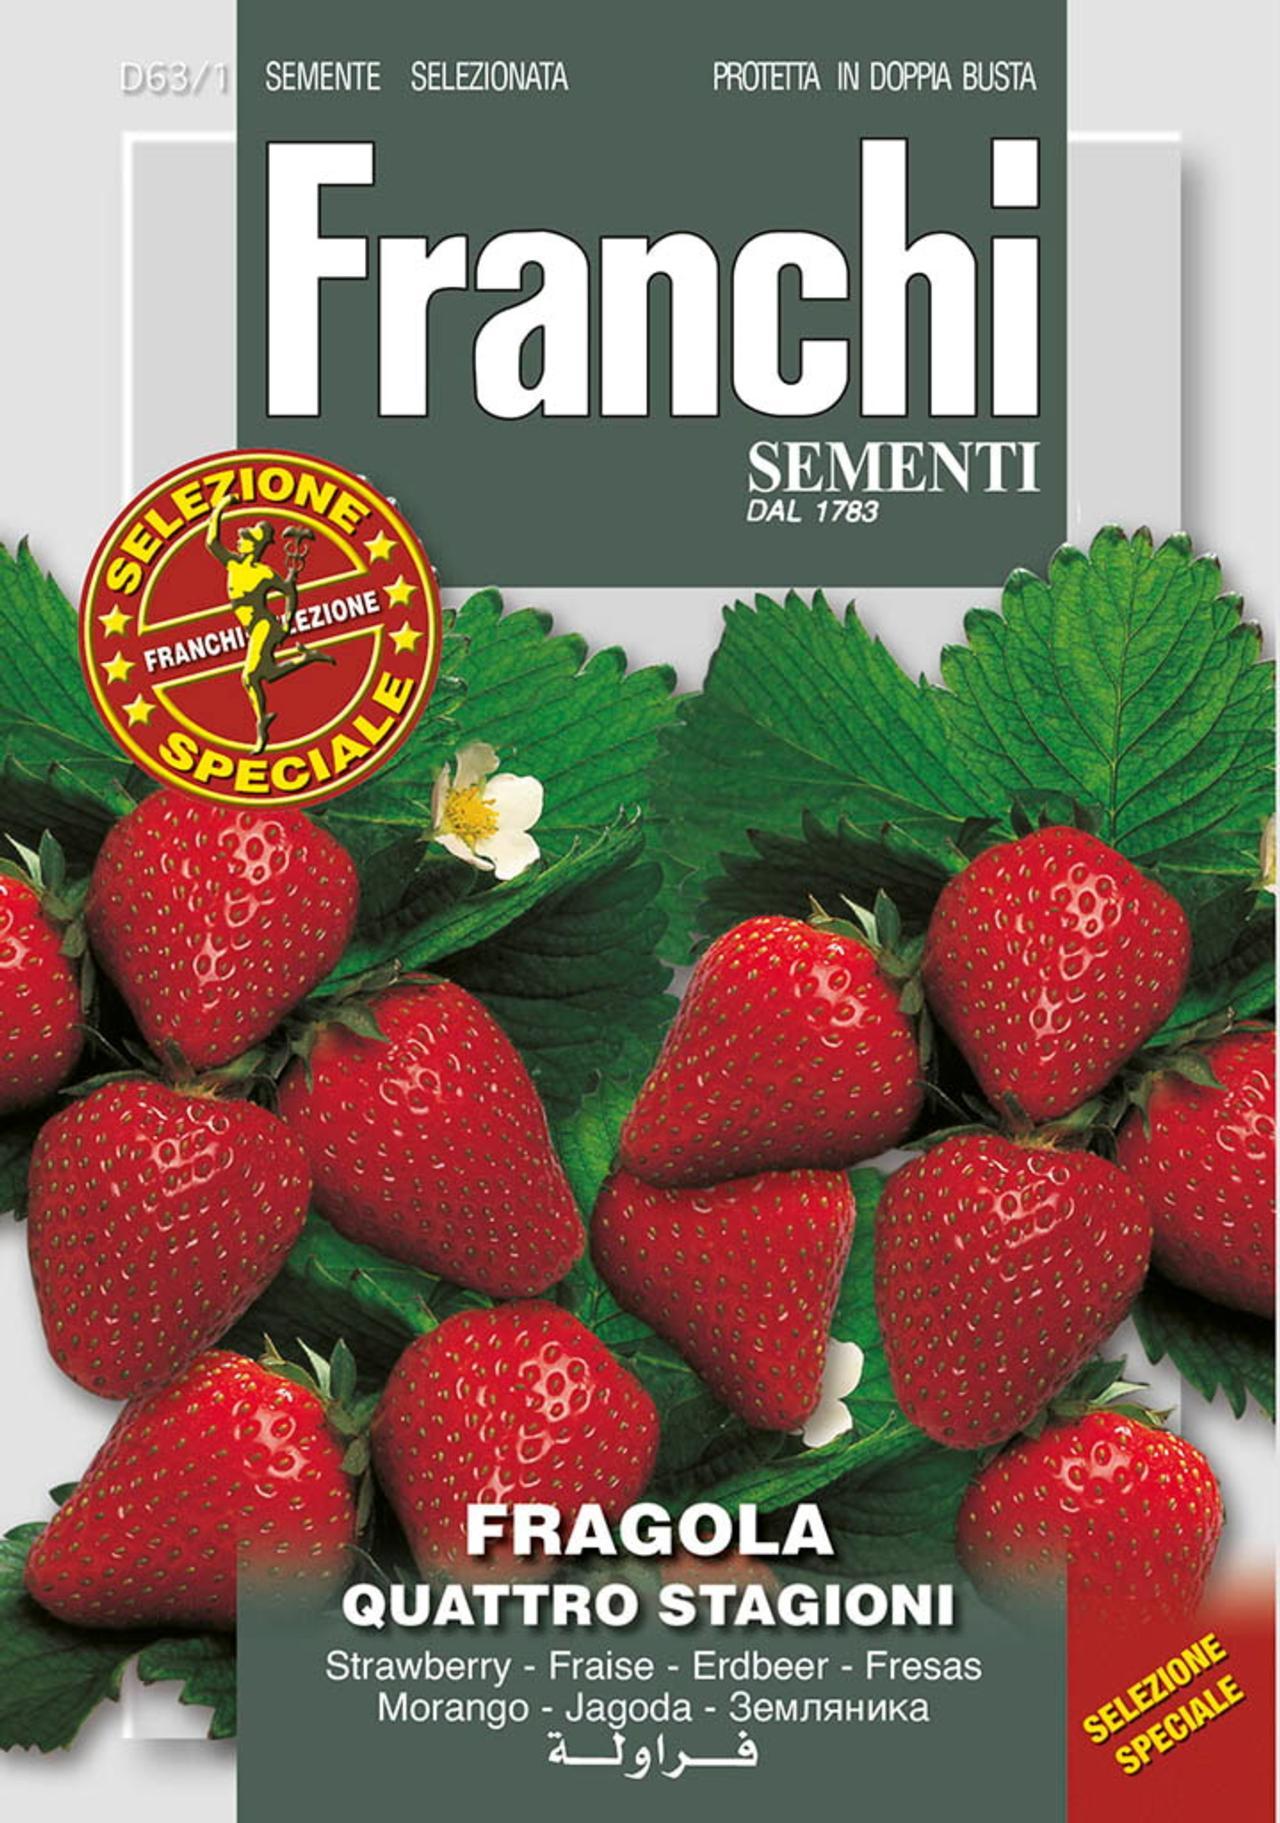 Fragaria x ananassa 'Quatro Stagioni' plant